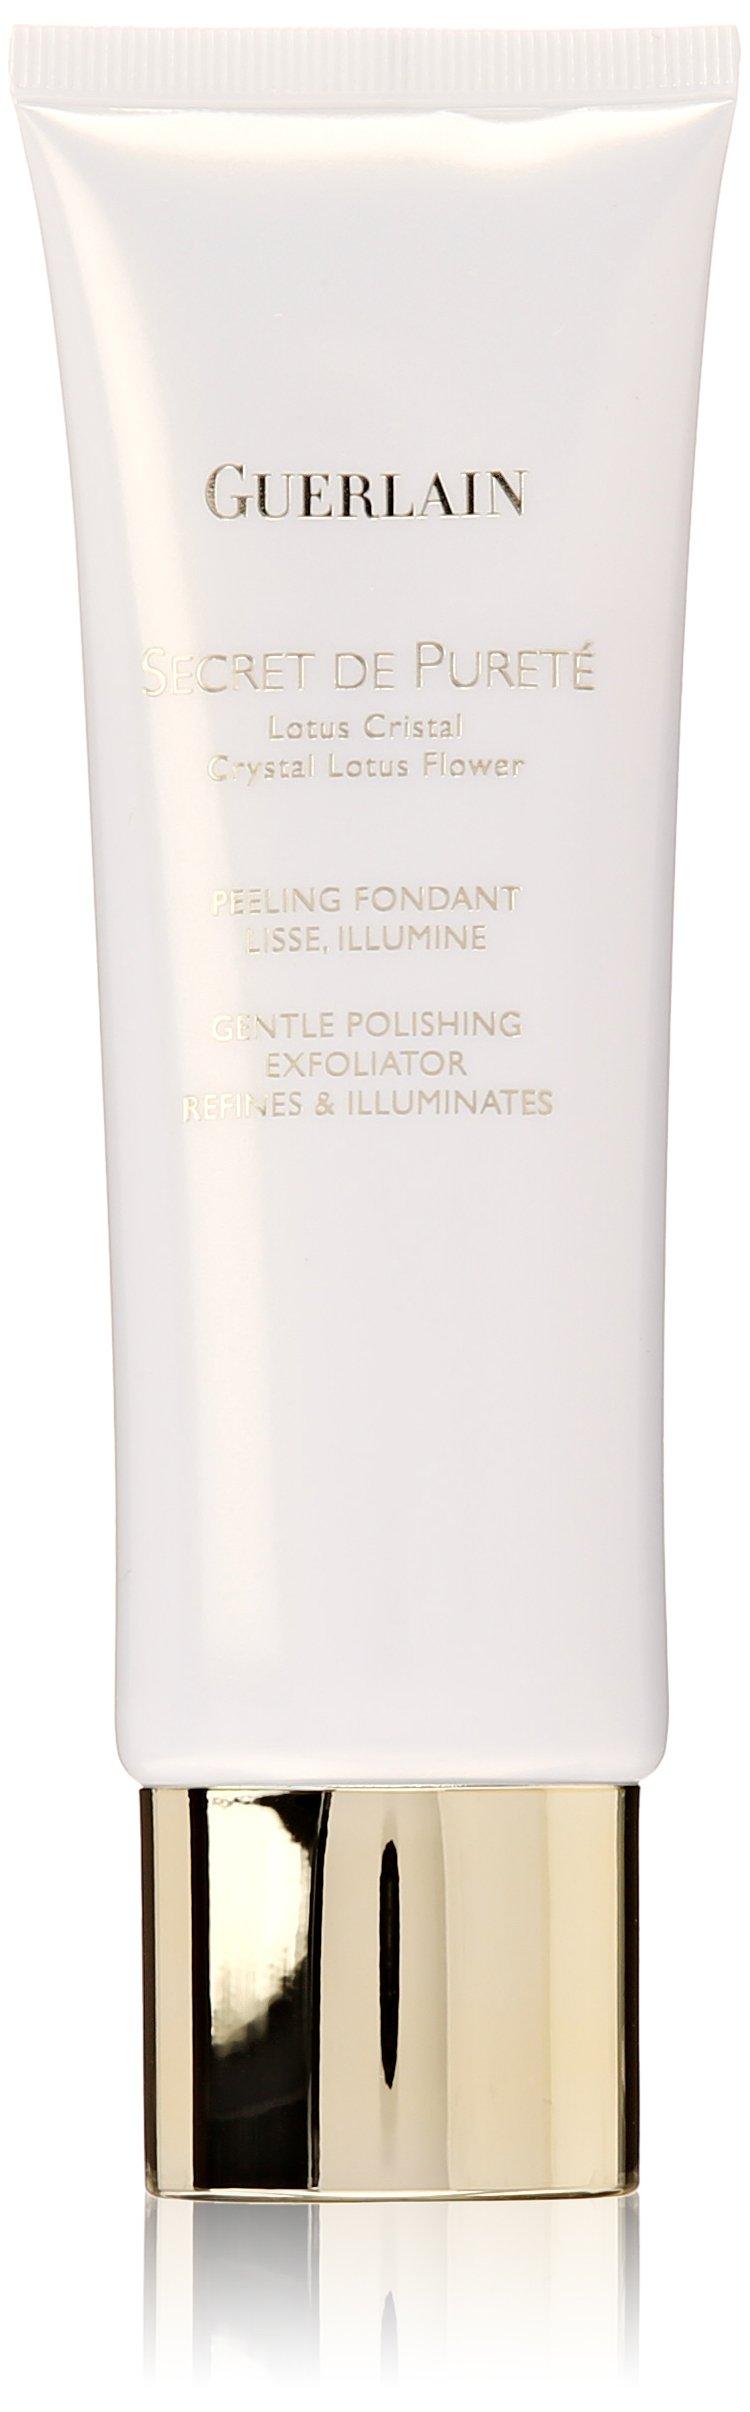 Guerlain Gentle Polishing Exfoliator, Secret De Purete, 2.4 Ounce